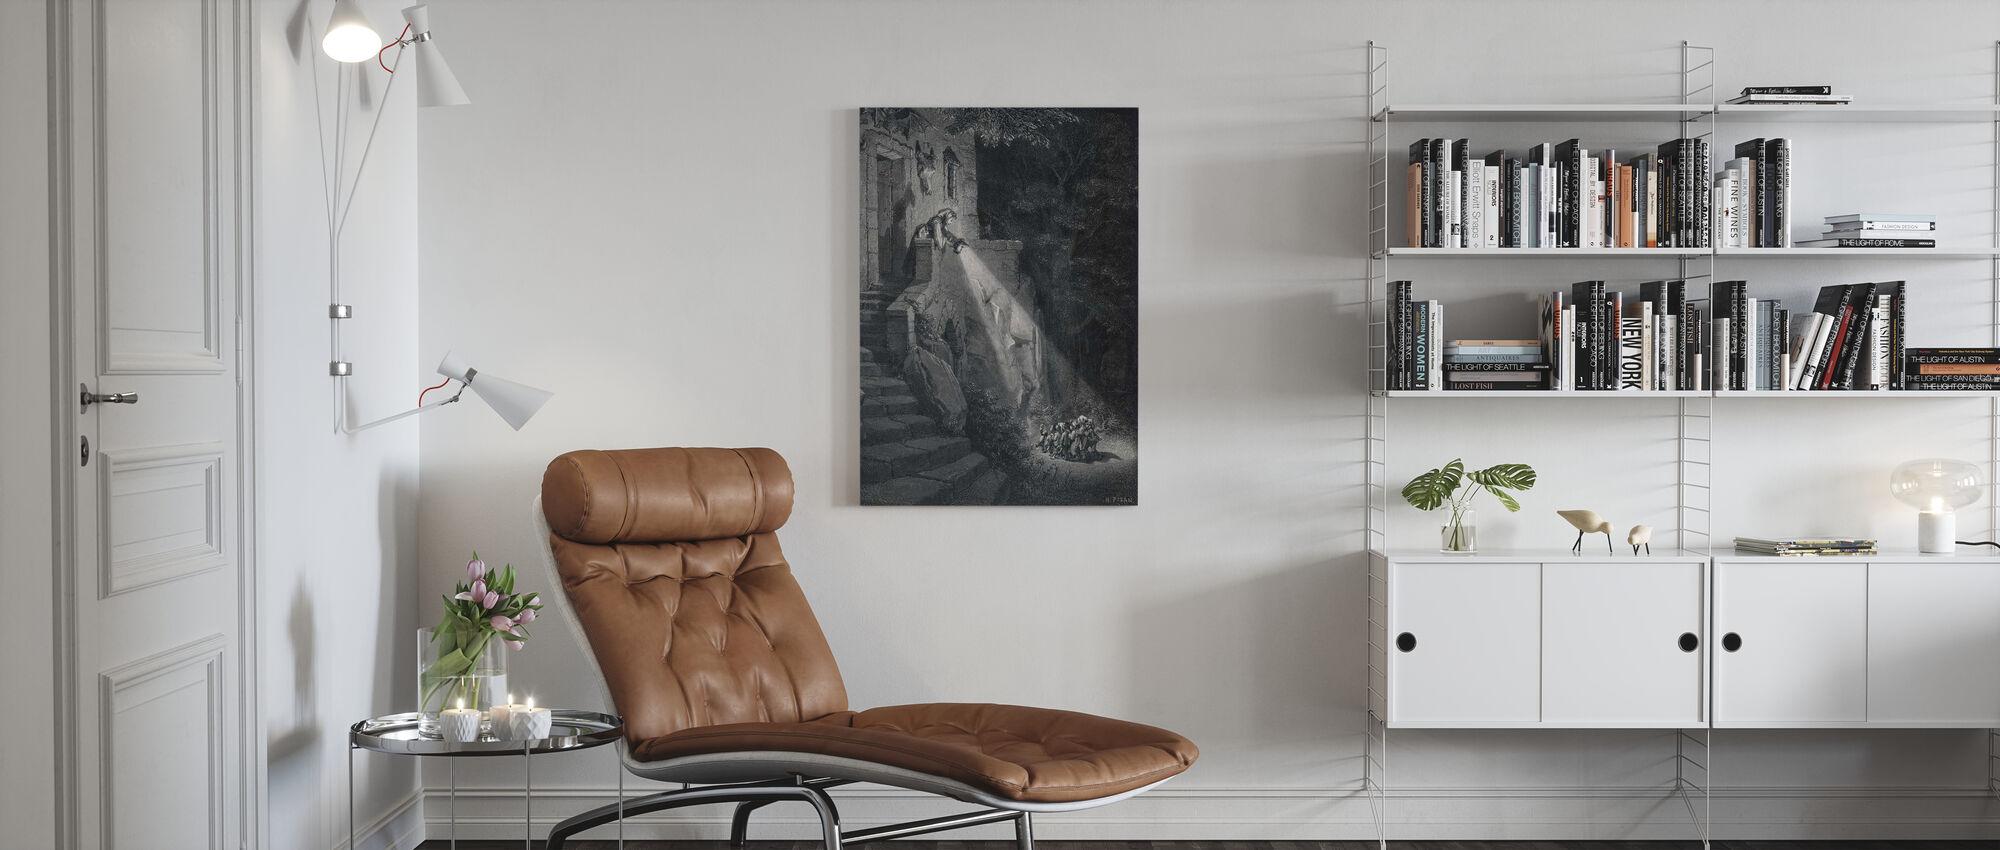 Gustave Dore - Ogre in het bos - Canvas print - Woonkamer